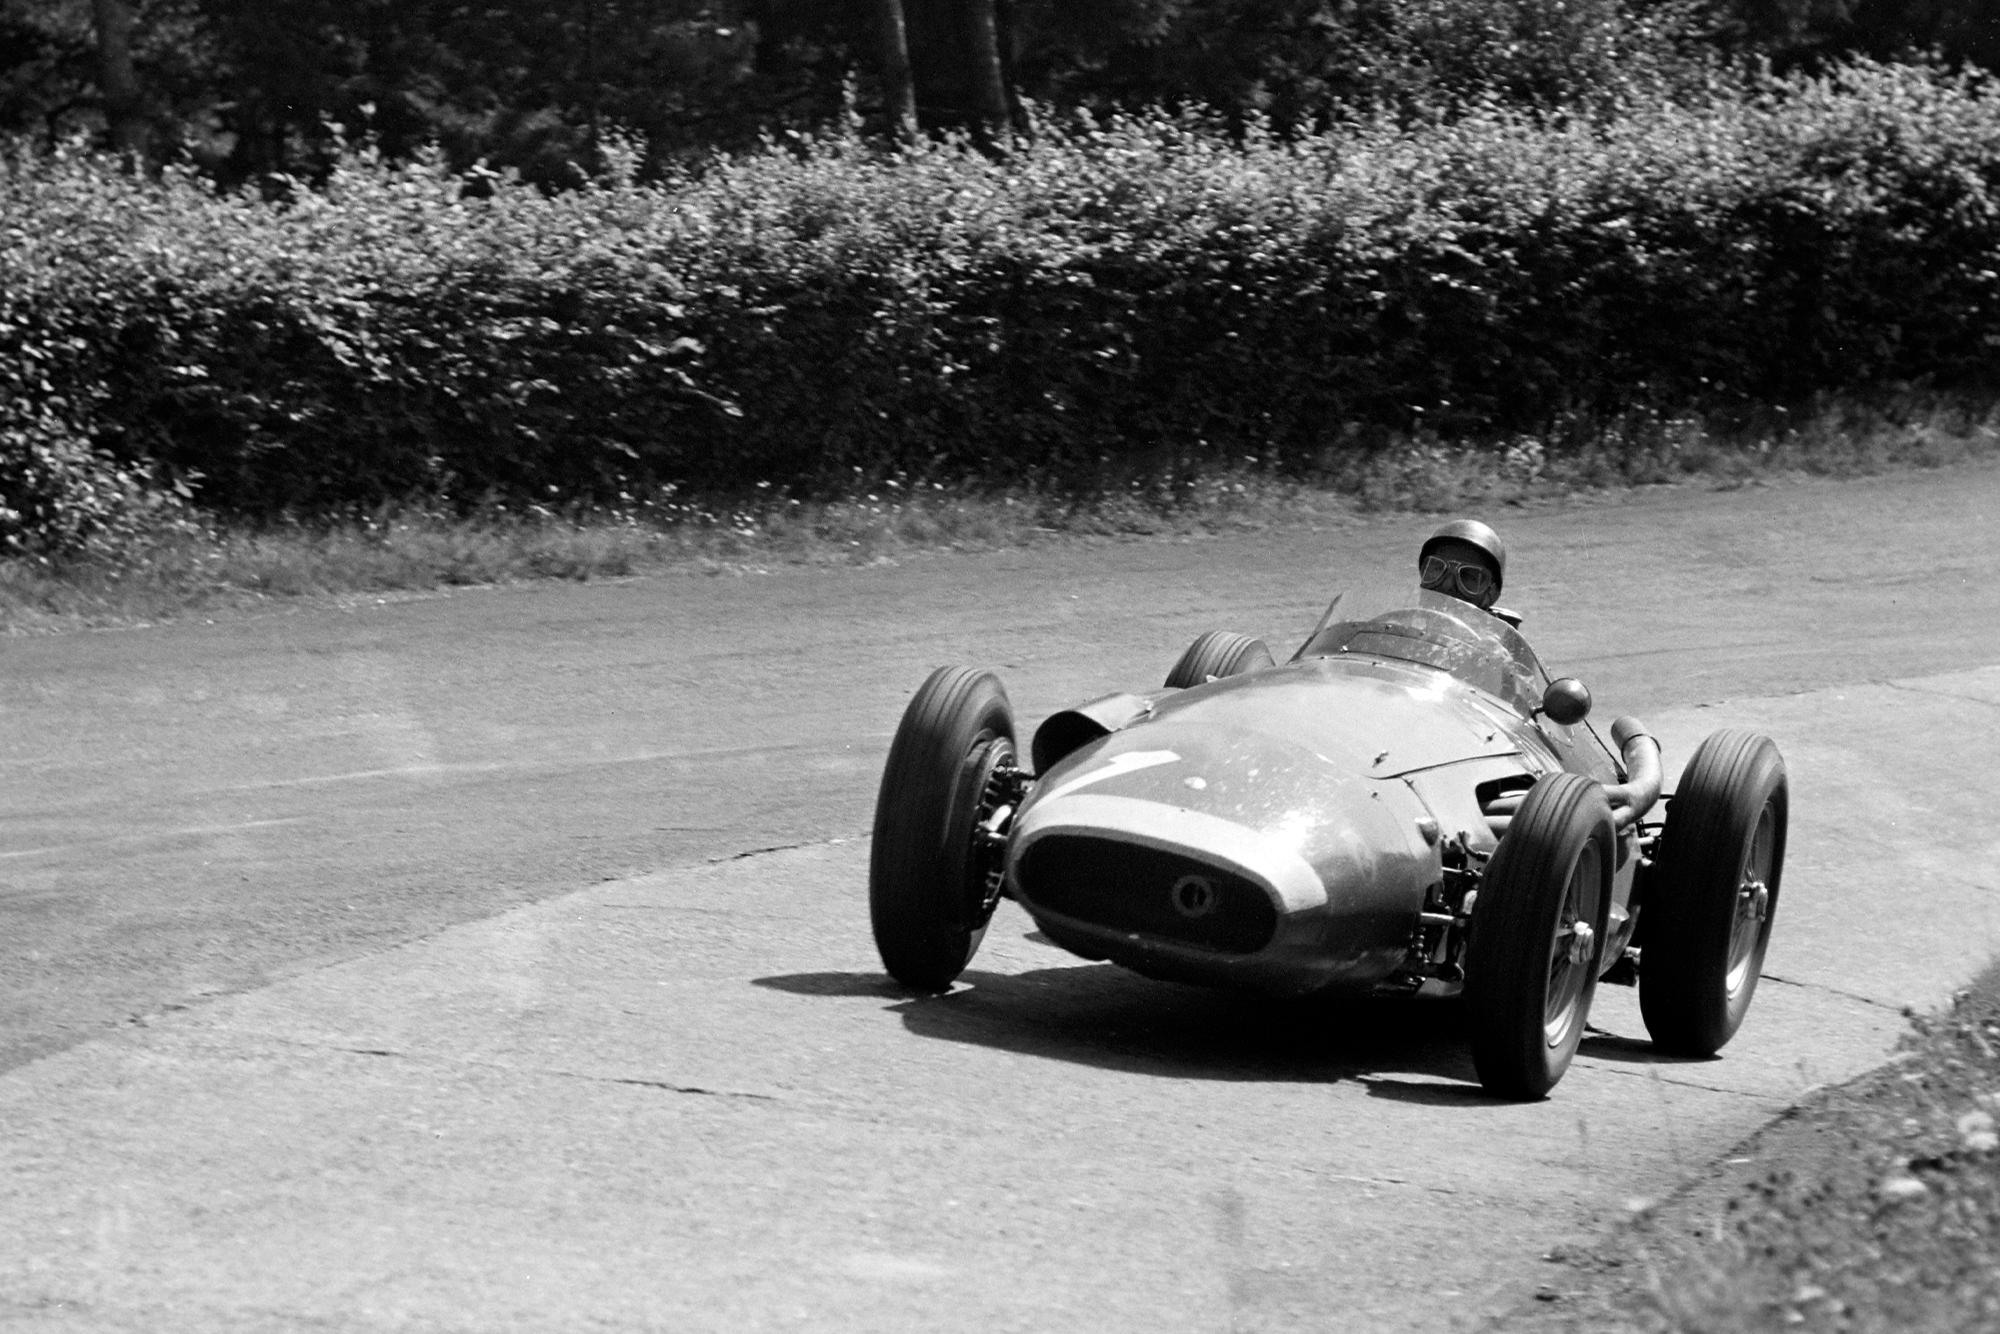 Juan Manuel Fangio in his Maserati 250F during the 1957 German Grand Prix.